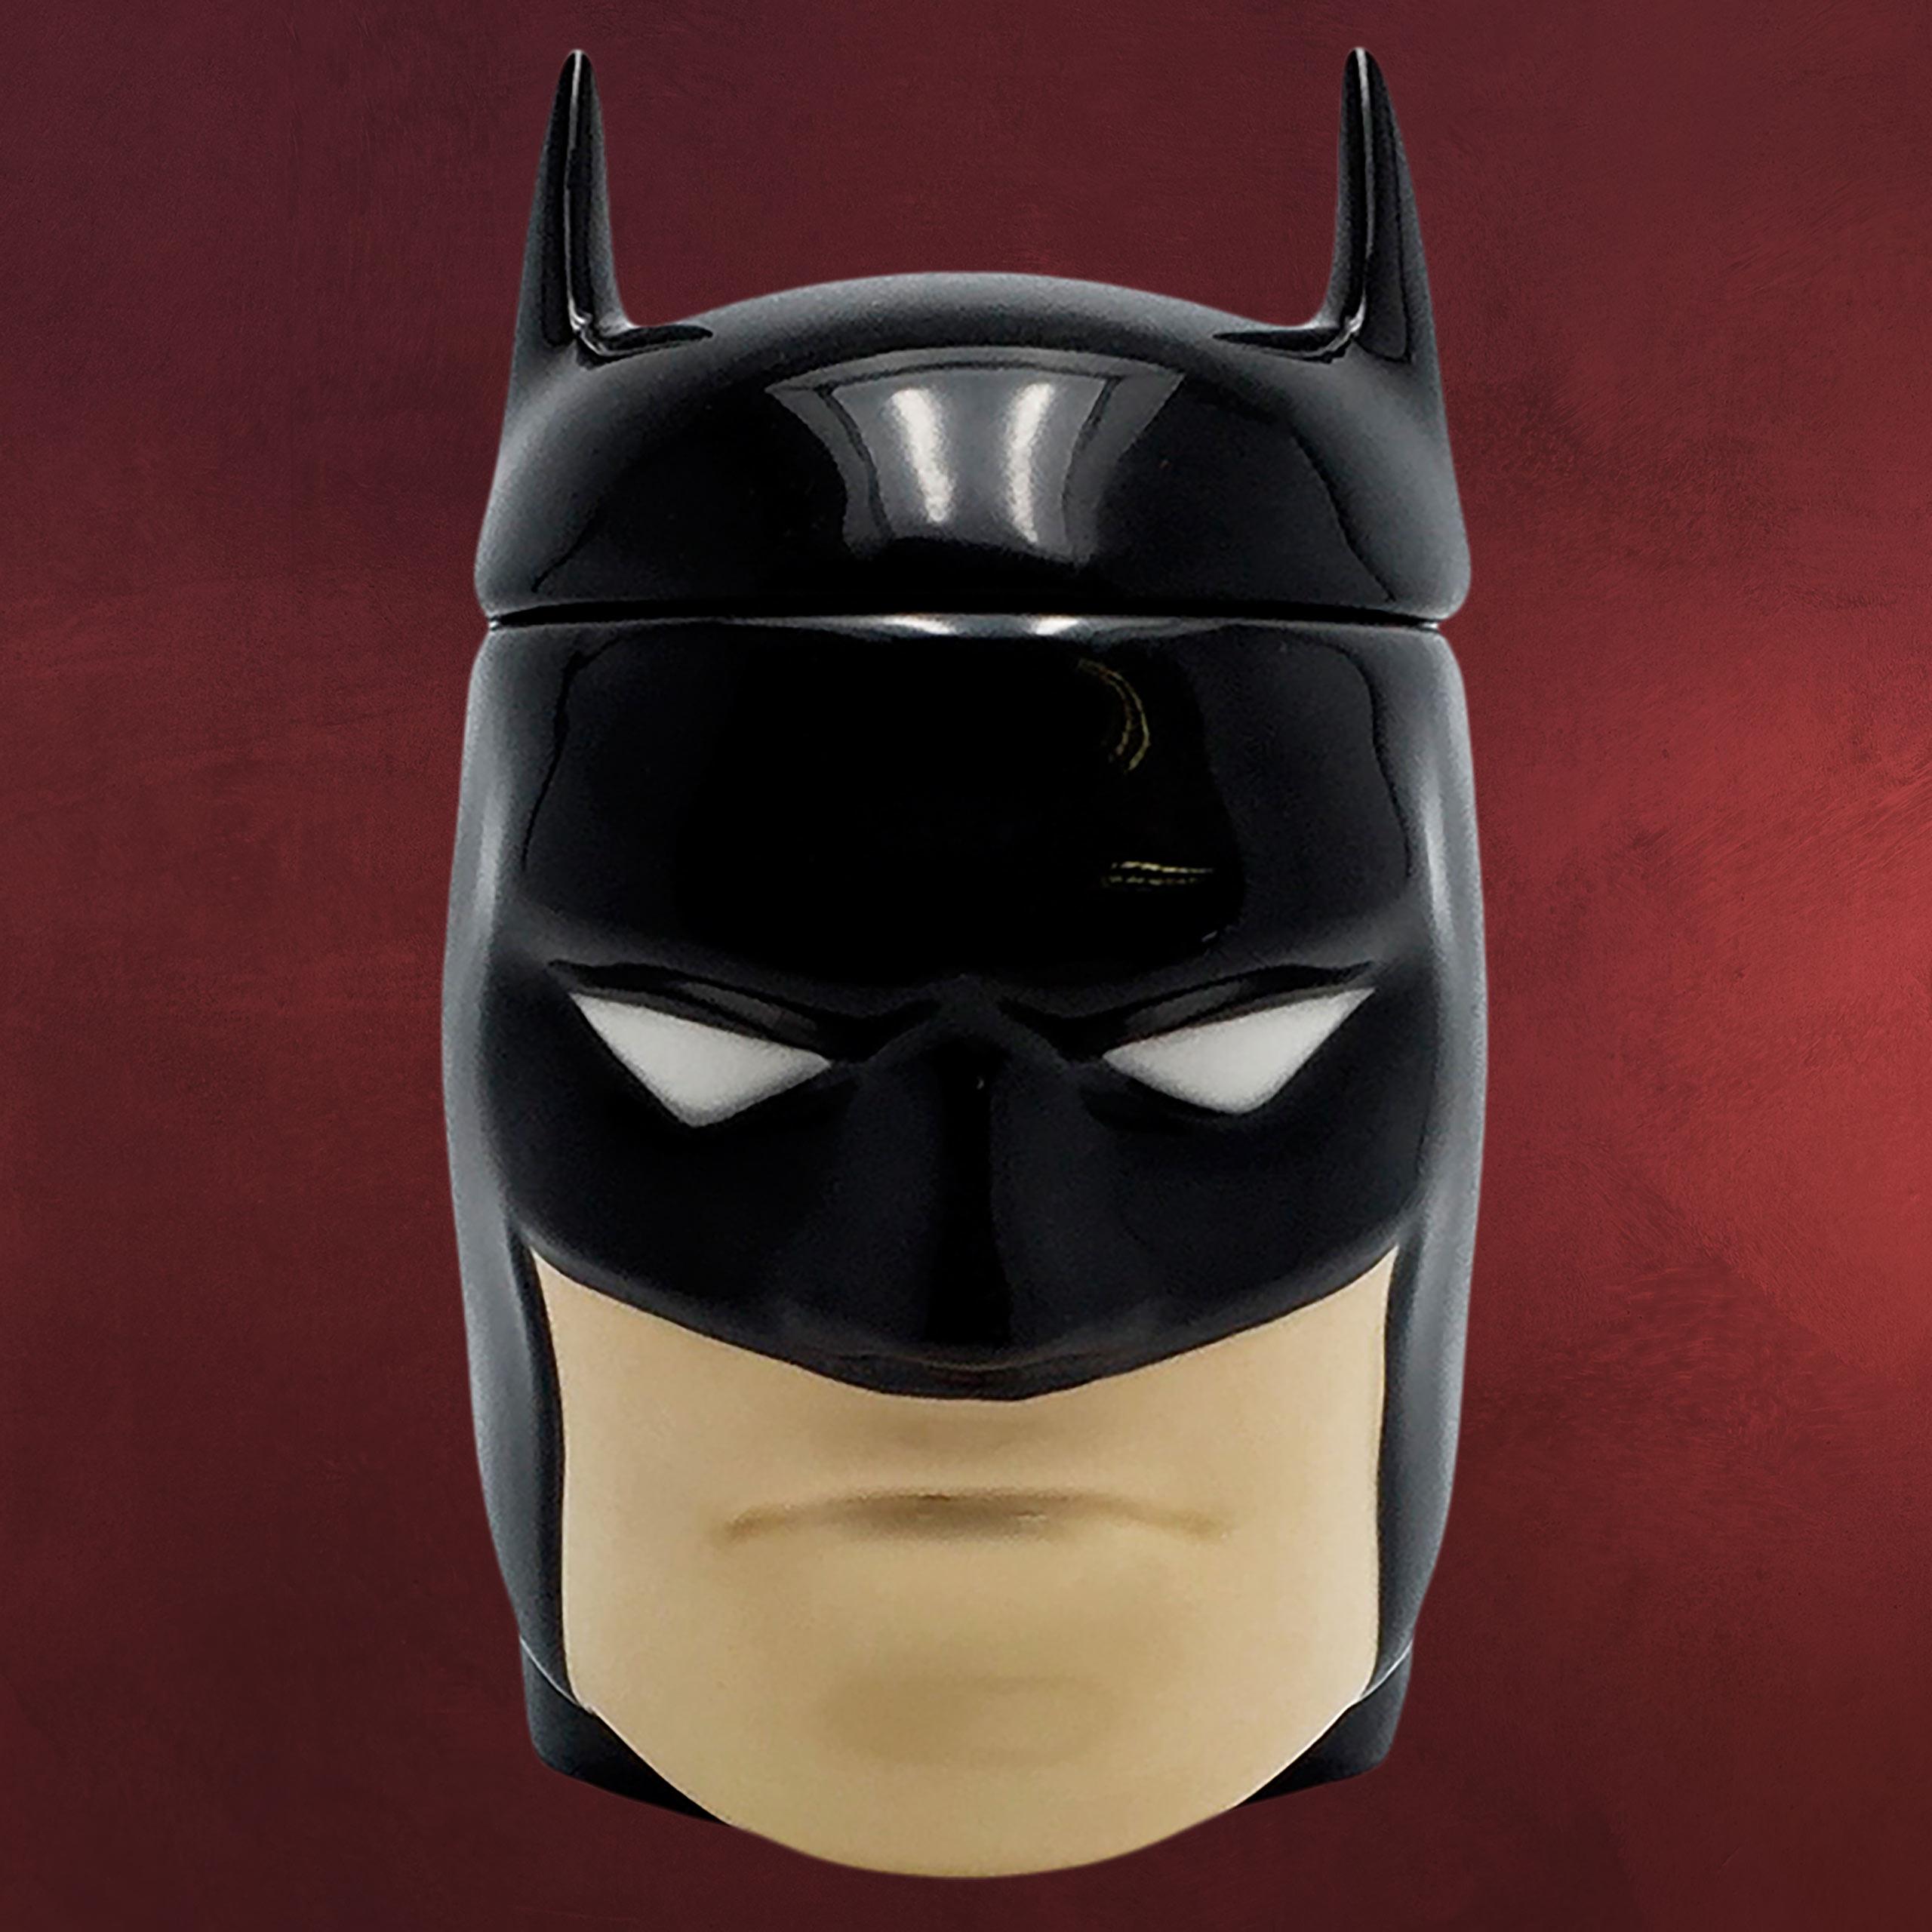 batman 3d tasse mit deckel elbenwald. Black Bedroom Furniture Sets. Home Design Ideas